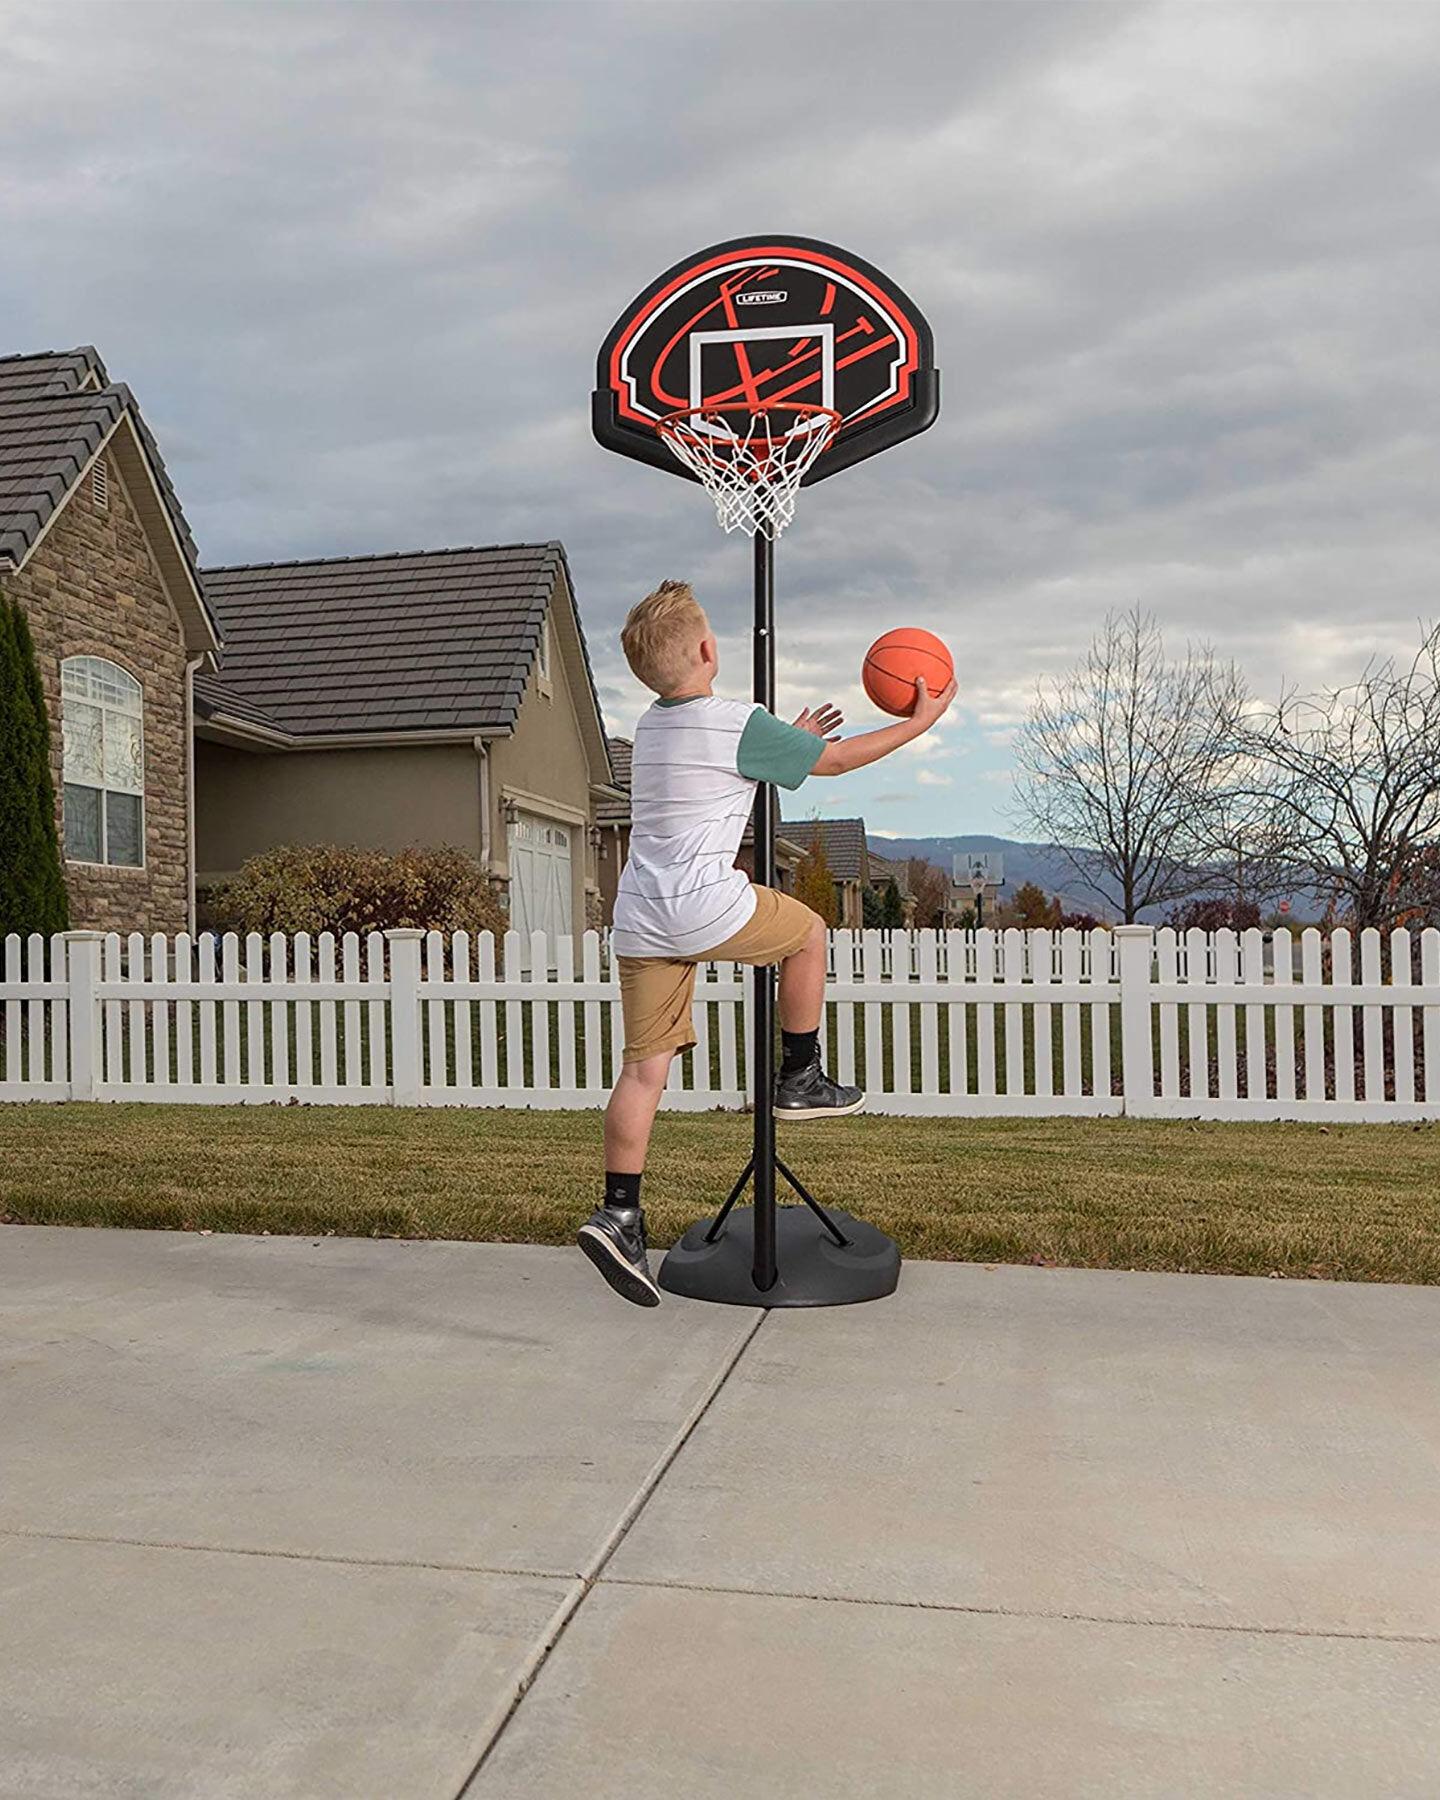 Attrezzatura basket LIFETIME IMPIANTO BASKET JR S2000549 896 - scatto 3